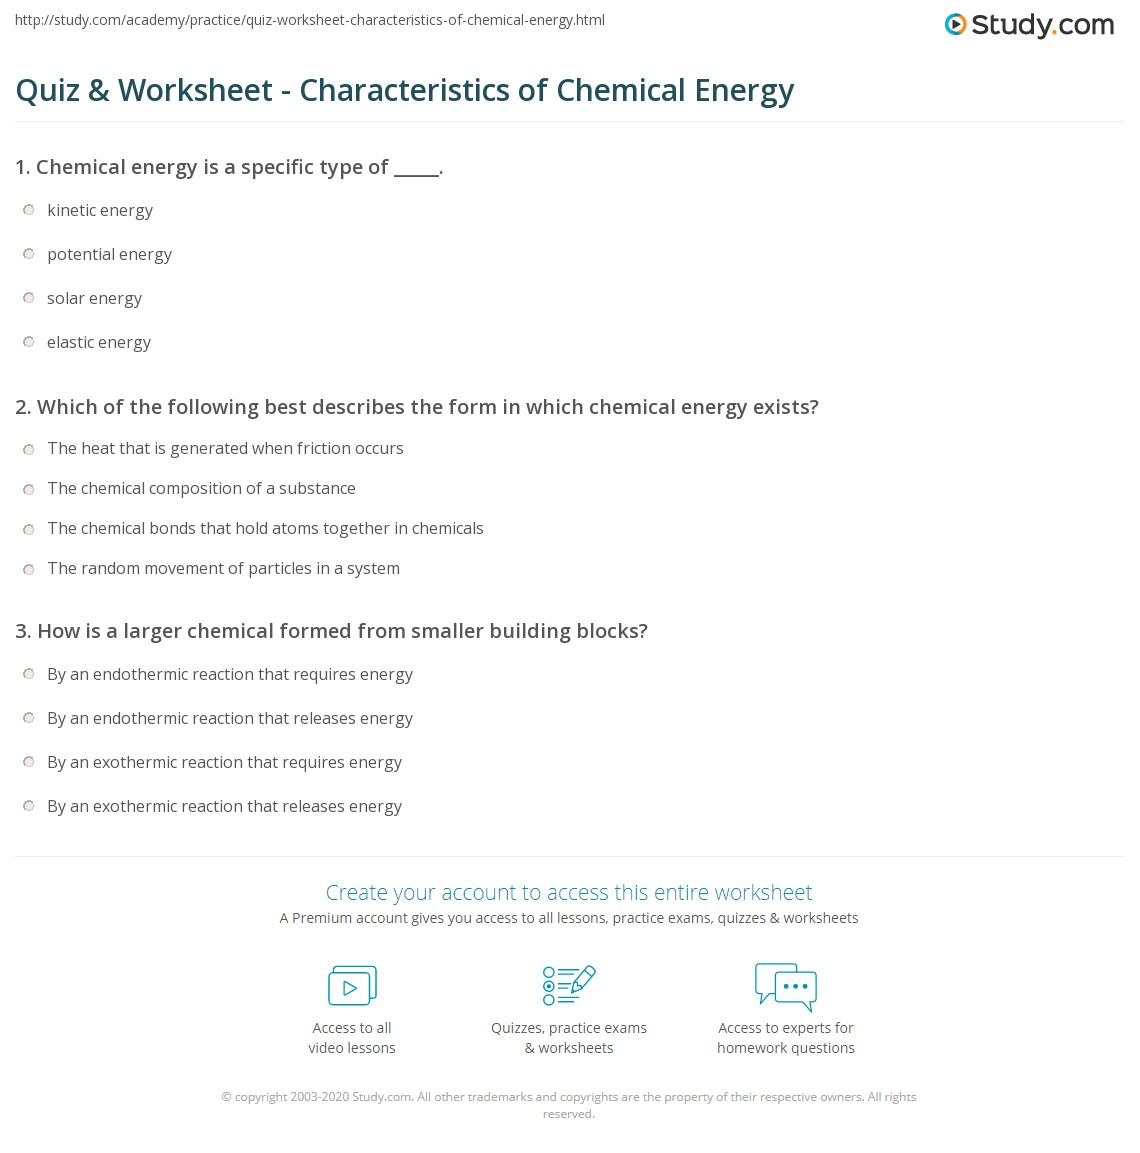 Quiz & Worksheet - Characteristics of Chemical Energy | Study.com